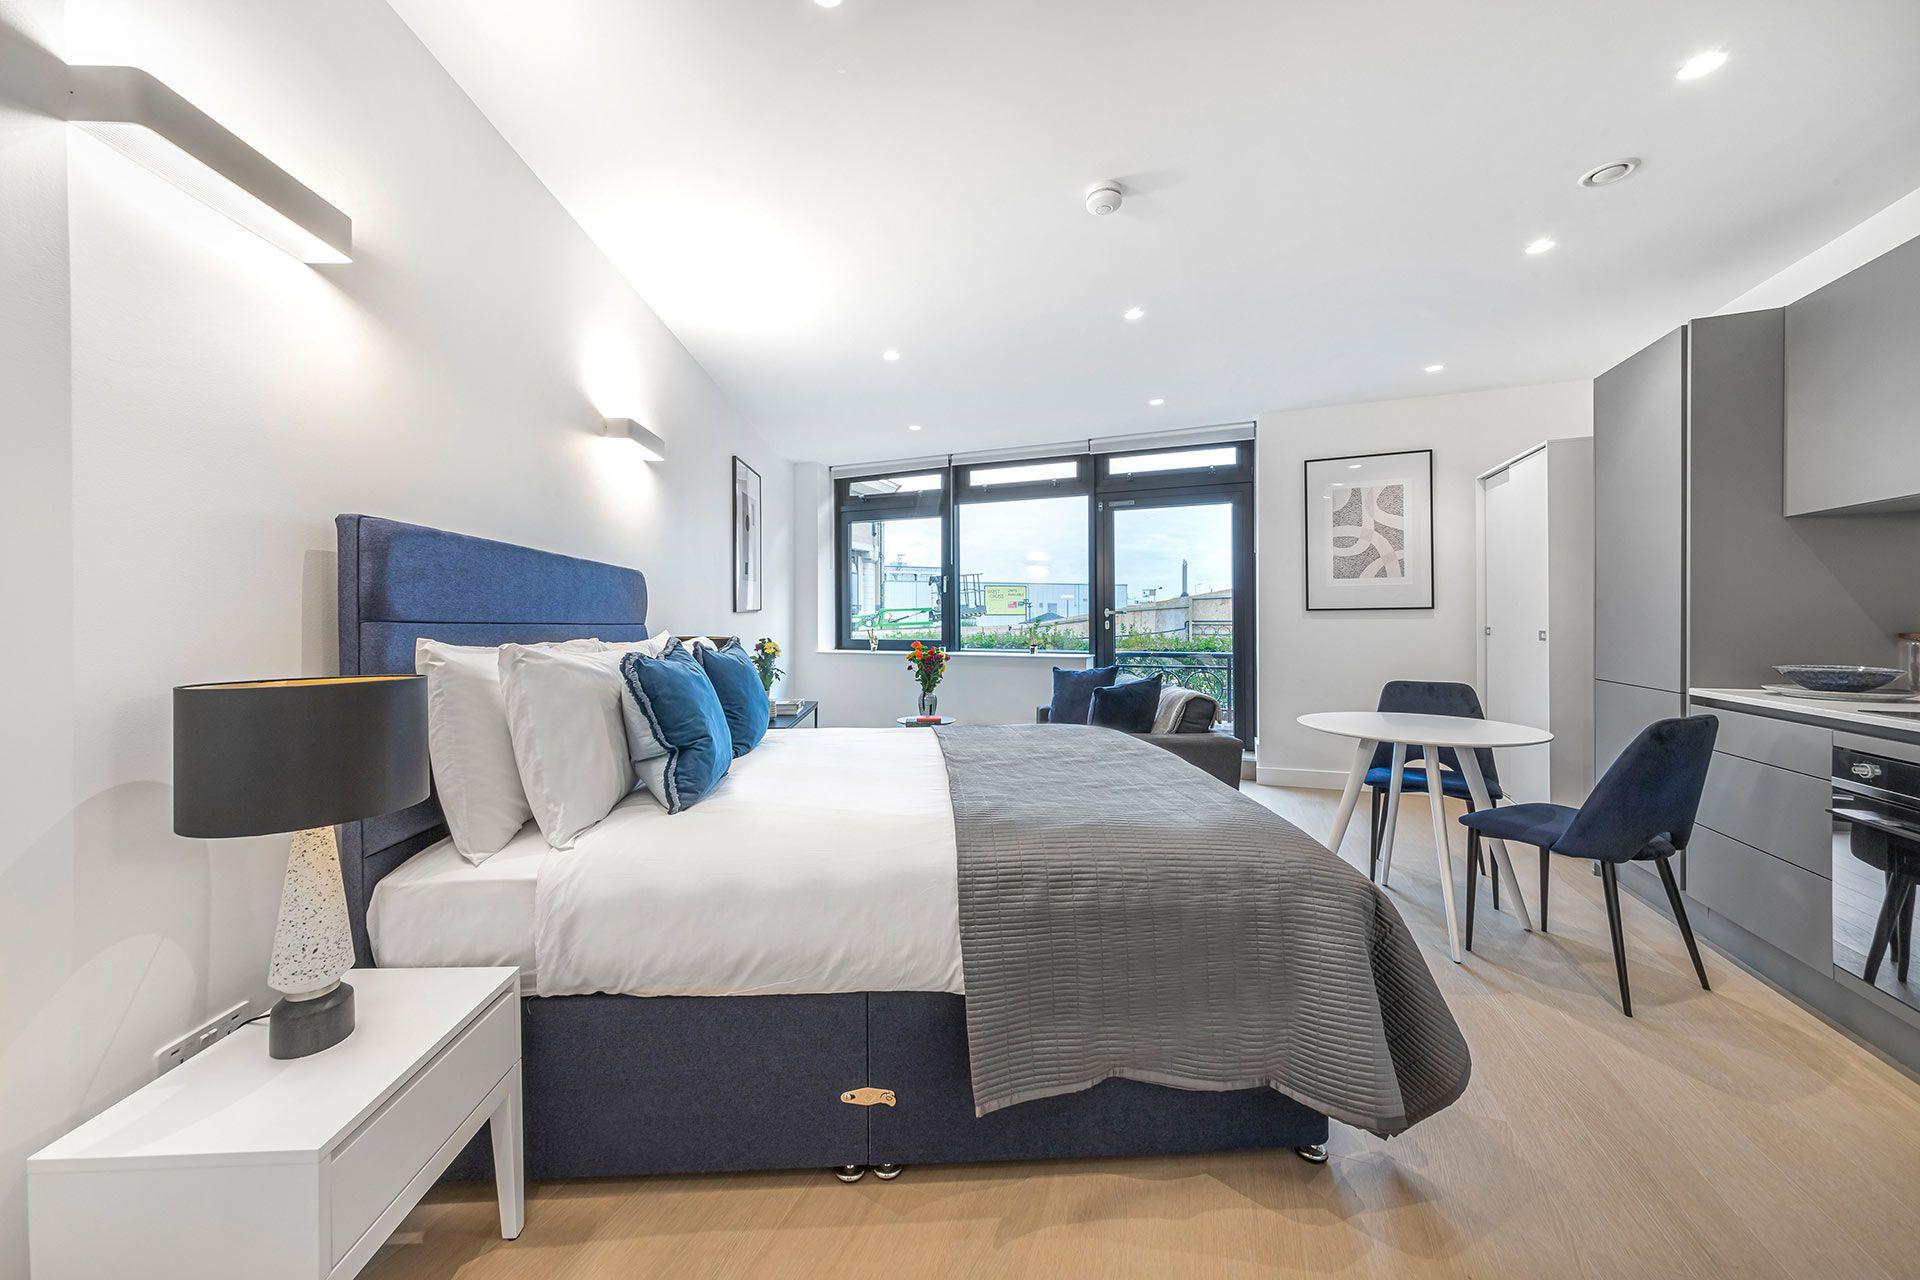 Studio apartment to rent in London SKI-VH-0040